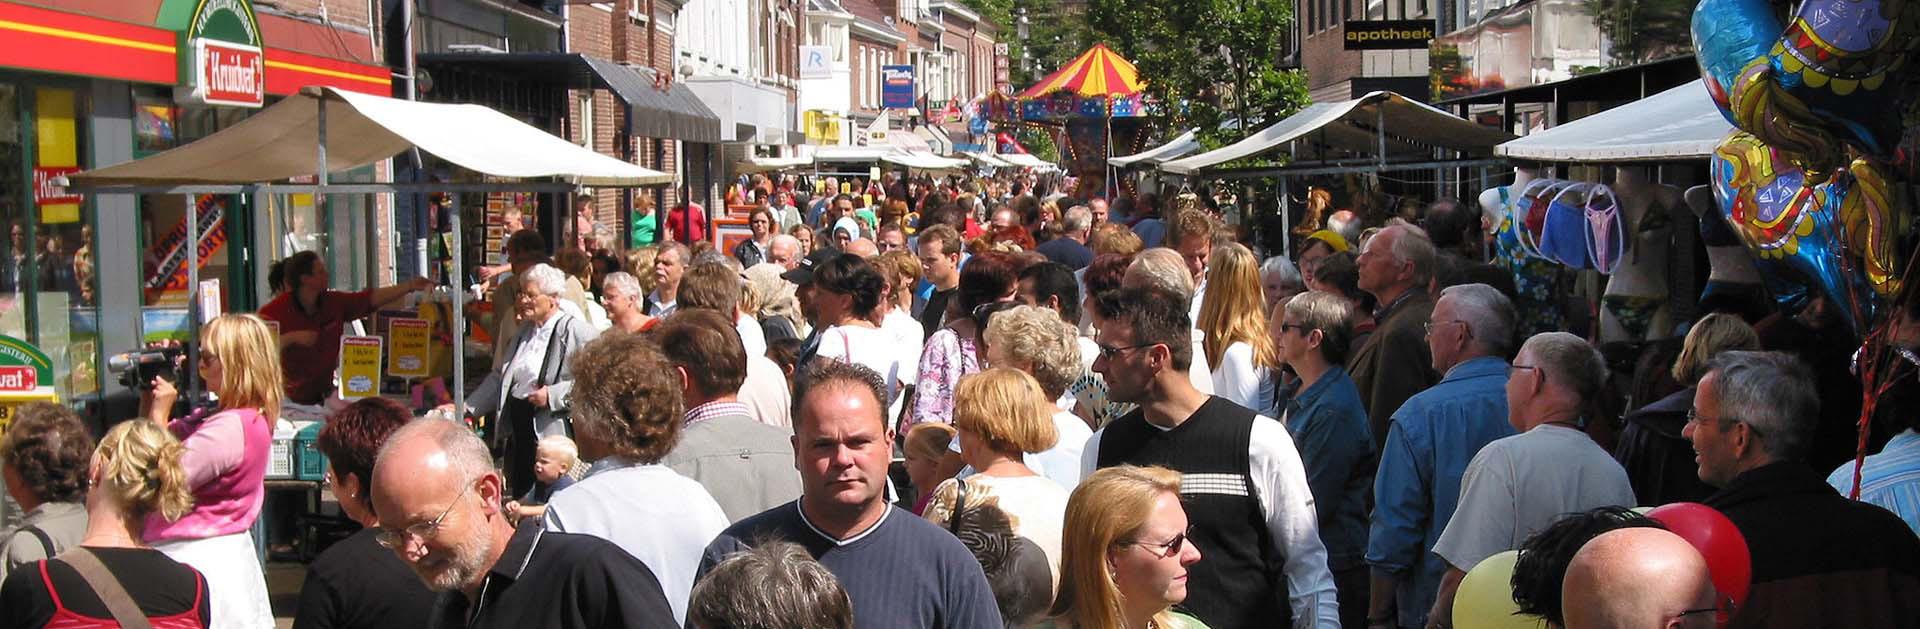 Jaarmarkten Braderieën  Regio Achterhoek - Liemers